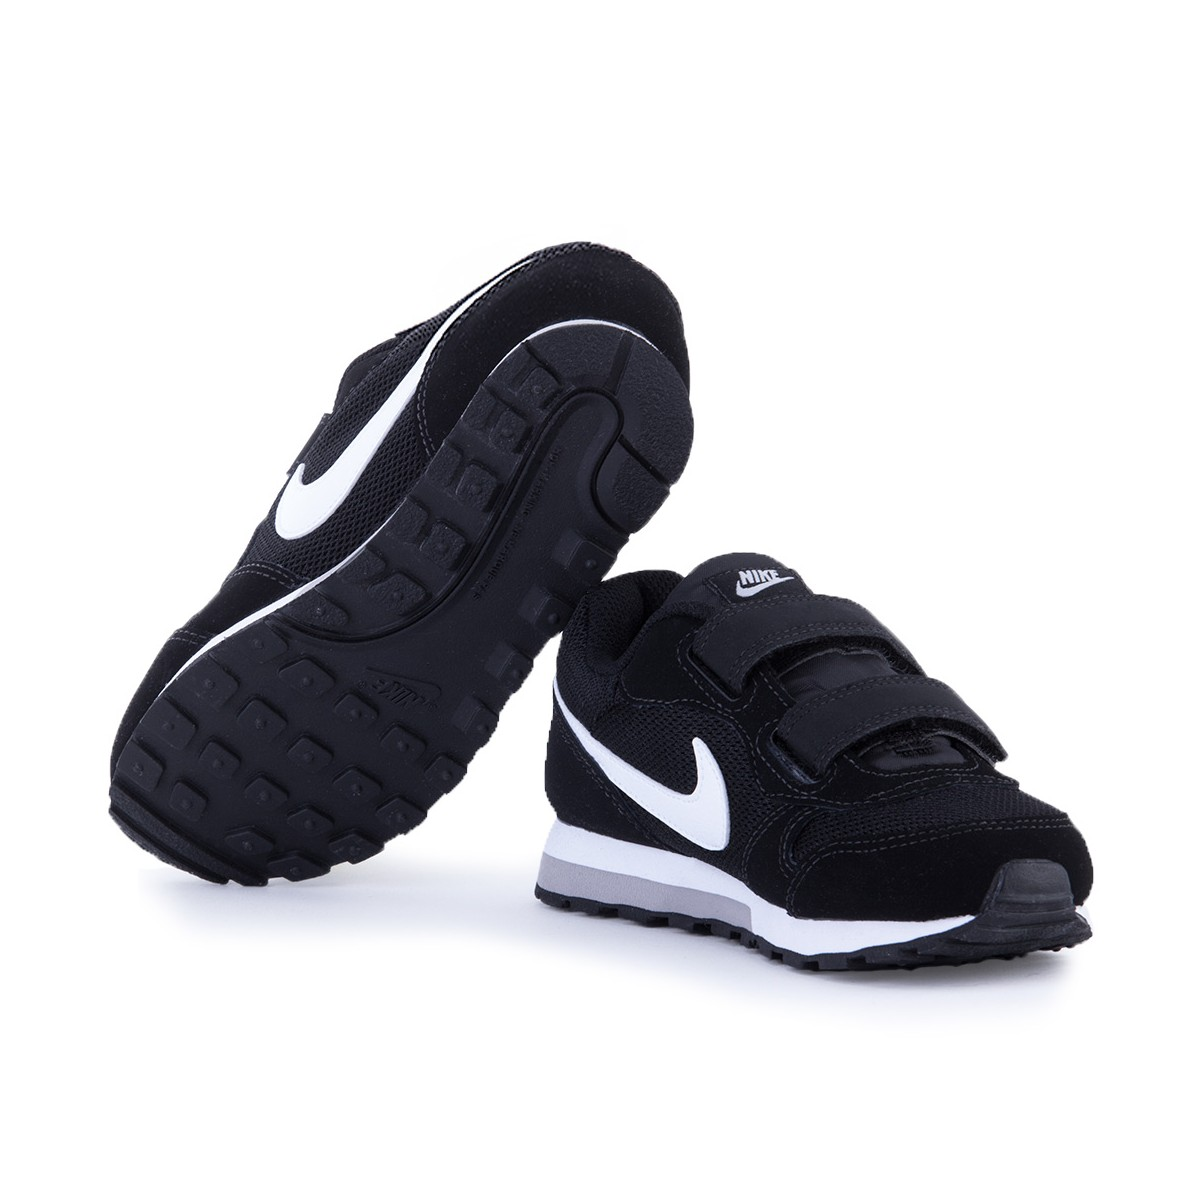 67d2b4f7f ... Nike MD Runner 2 Zapatillas Niño 807317 001 Negras ...